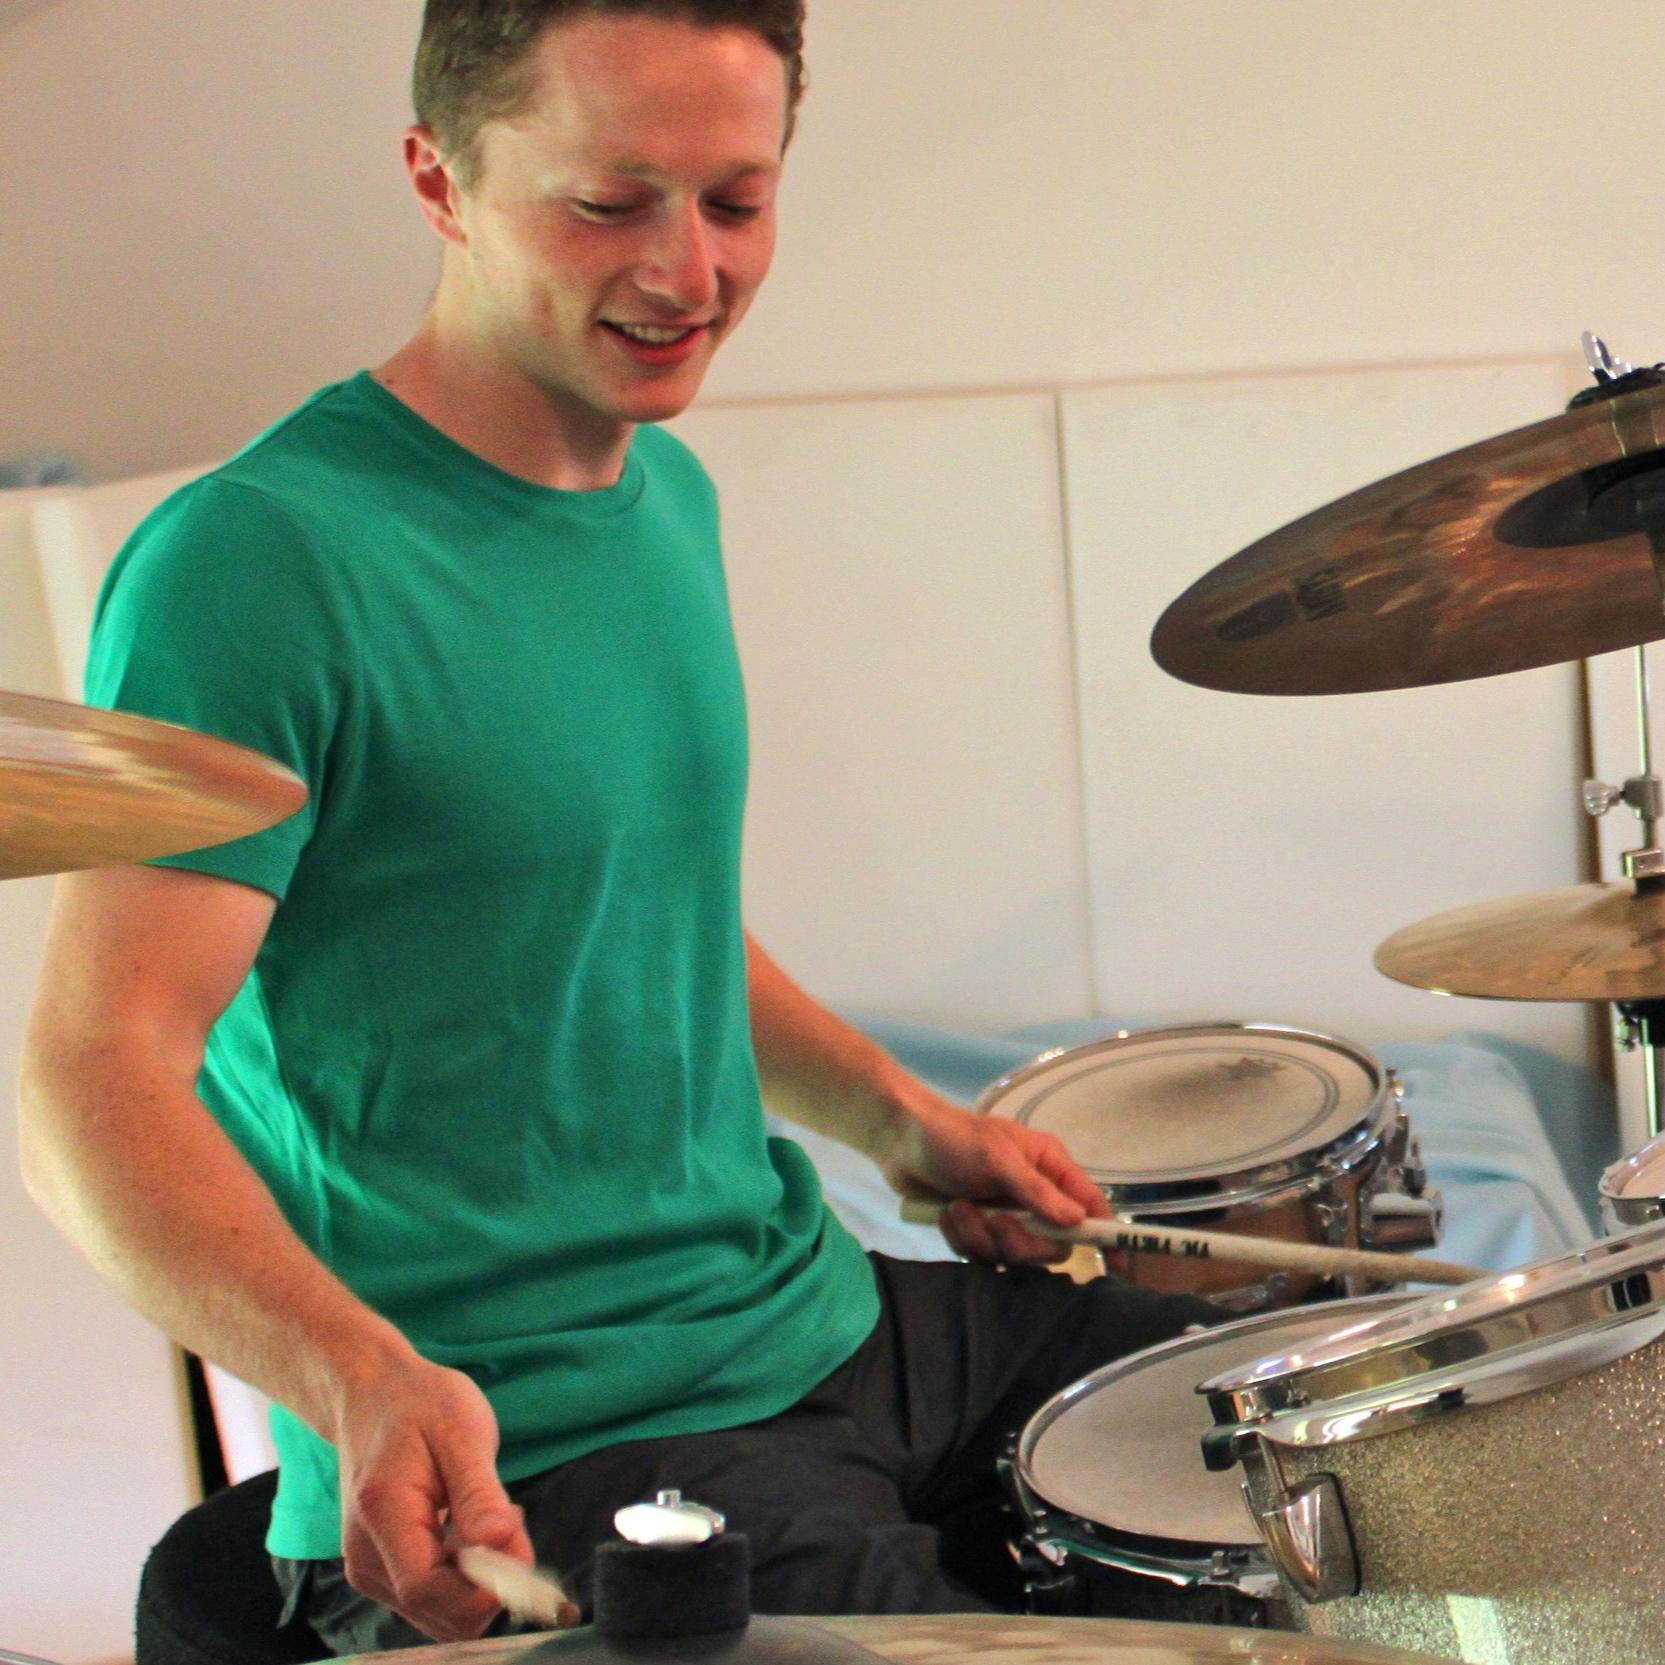 Schlagzeug_3x2.jpg